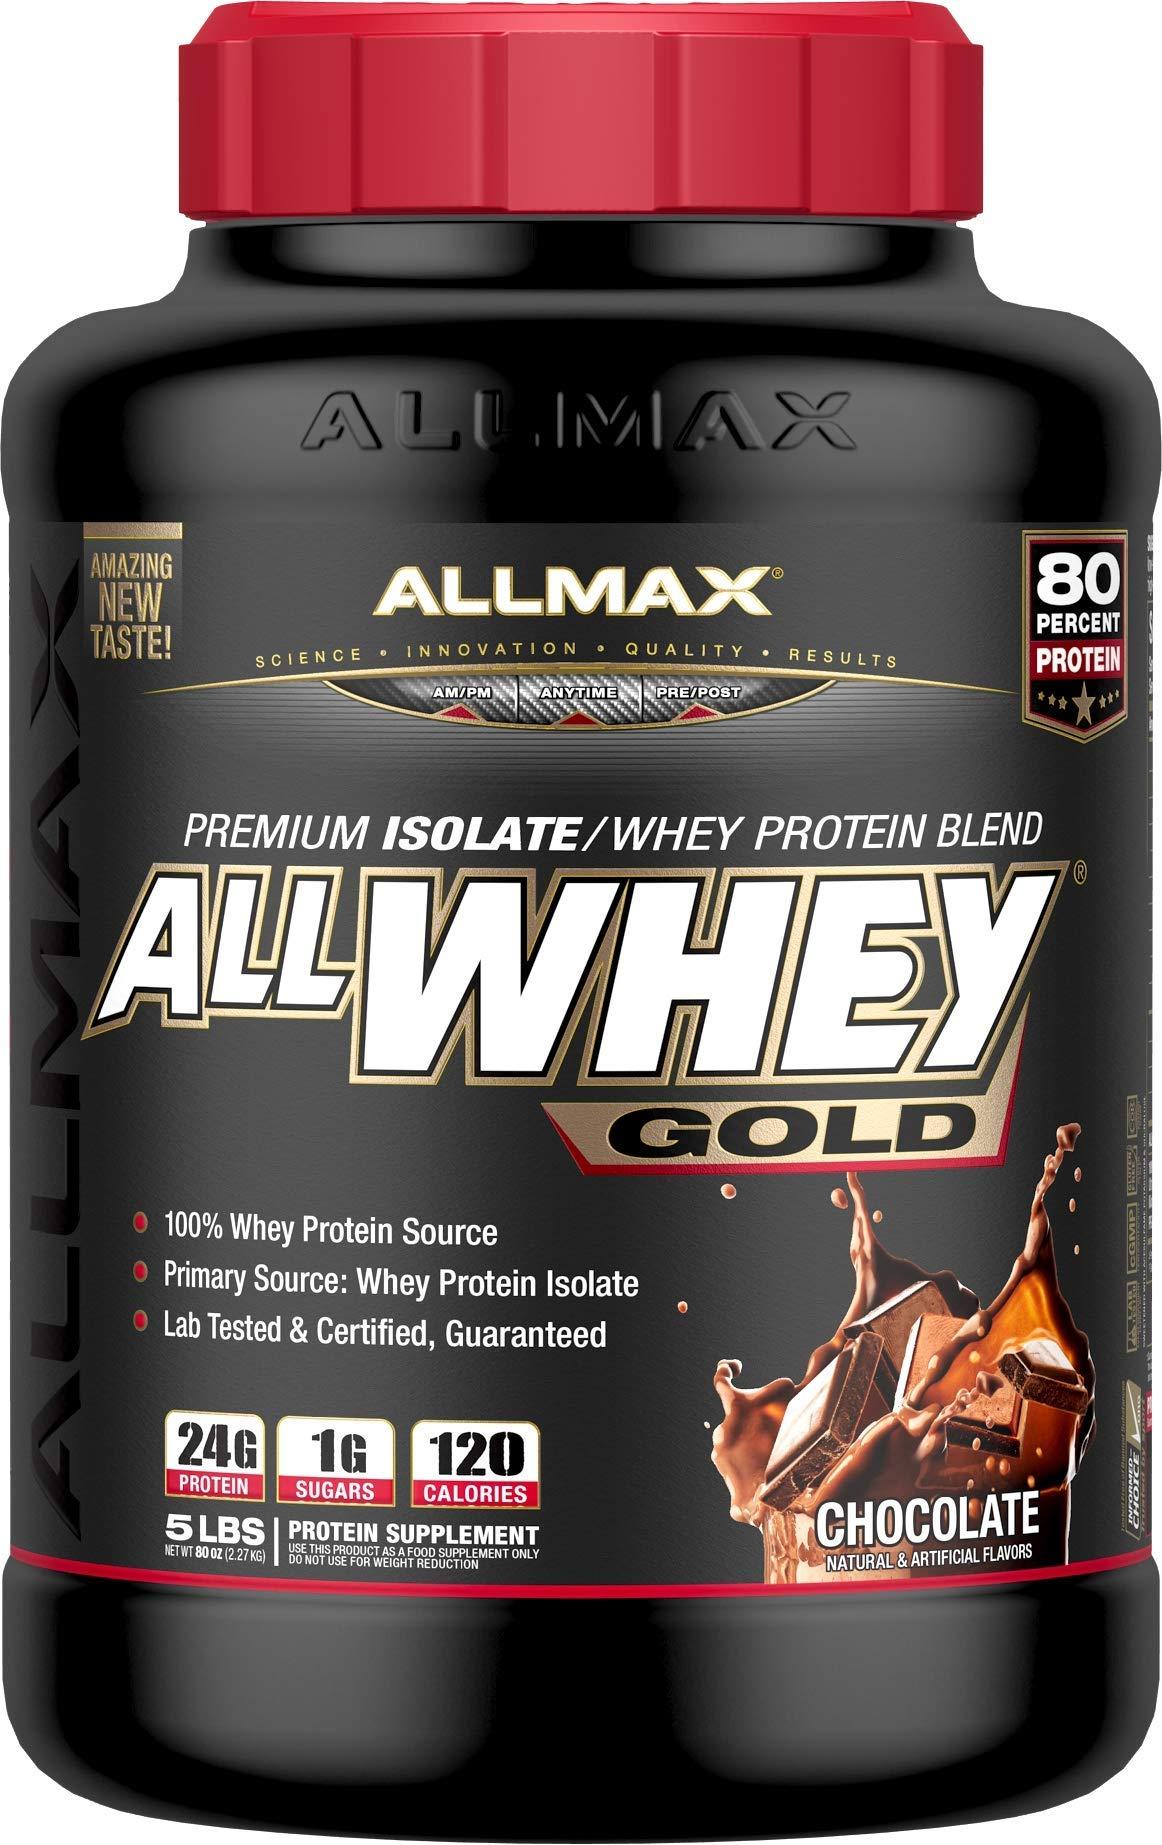 ALLMAX Nutrition AllWhey Gold Whey Protein, Chocolate, 5 lbs by ALLMAX Nutrition